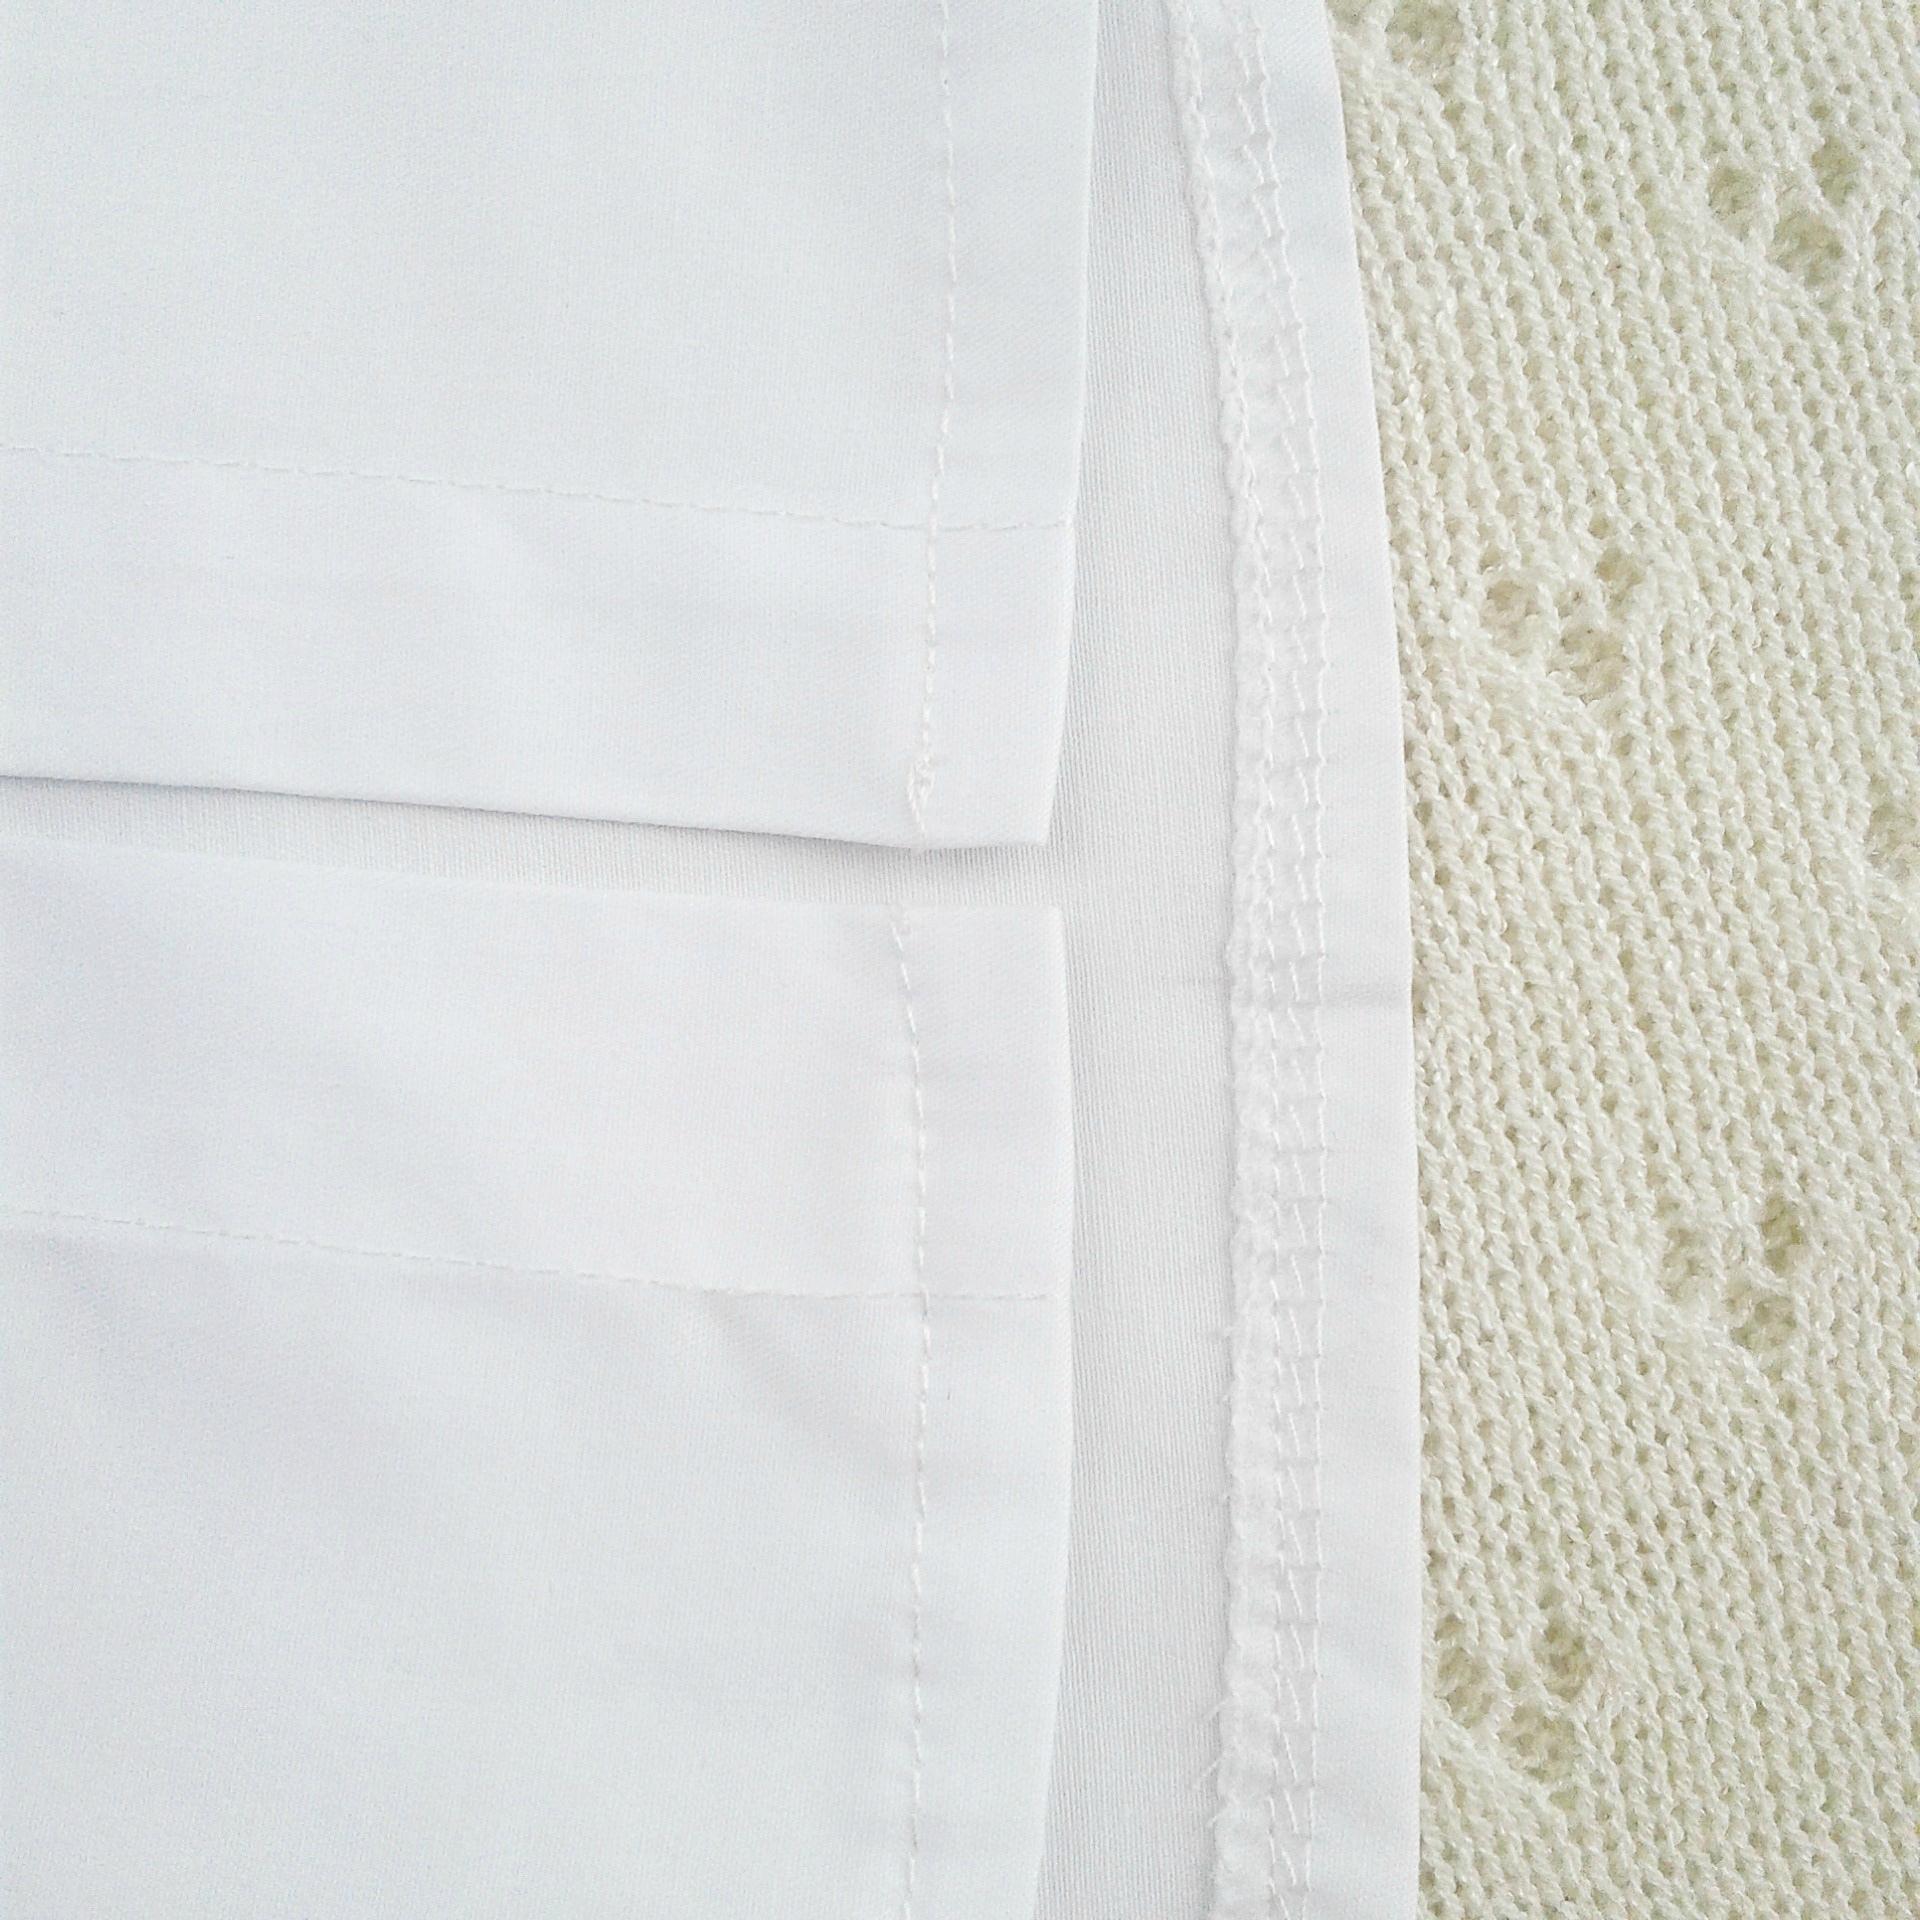 Shirt for doyклассическая рубашка для сына бренда vangull из магазина Mathew_wangs_store